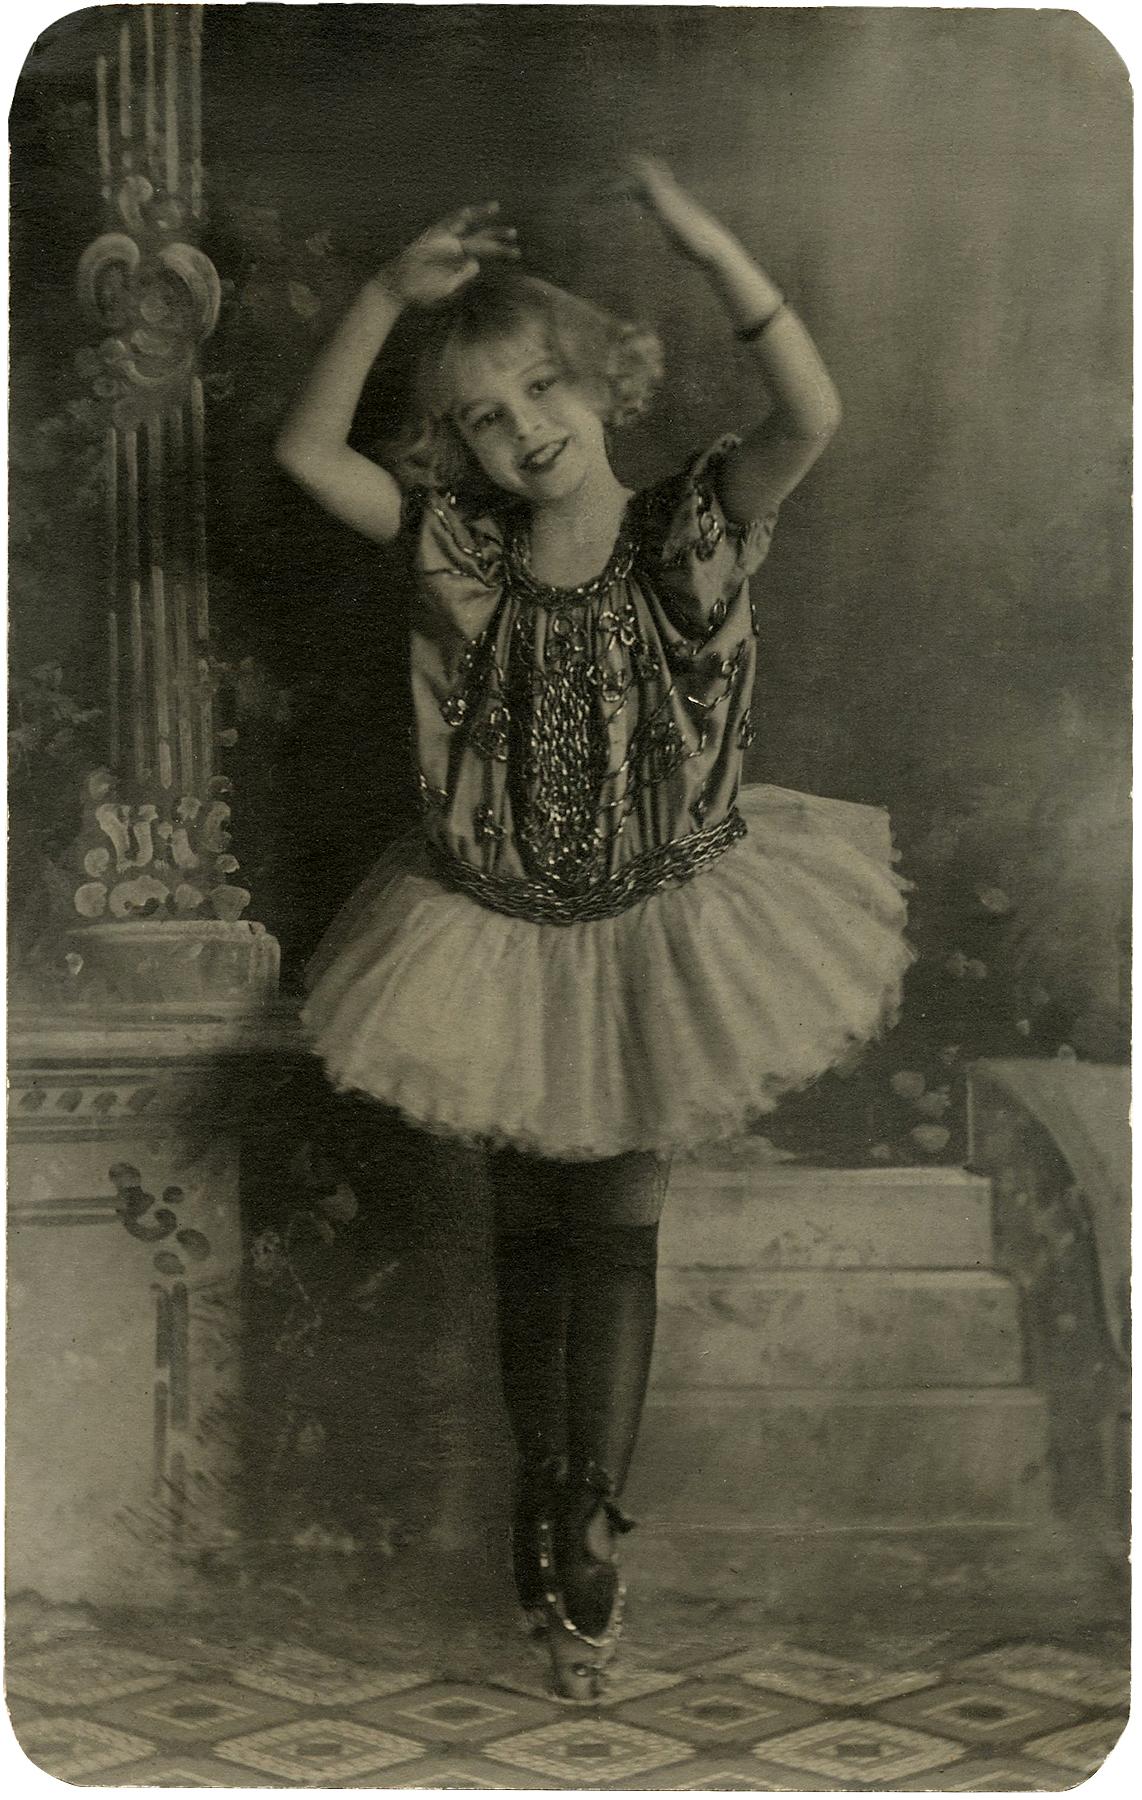 Vintage Ballerina Girl Photo Download